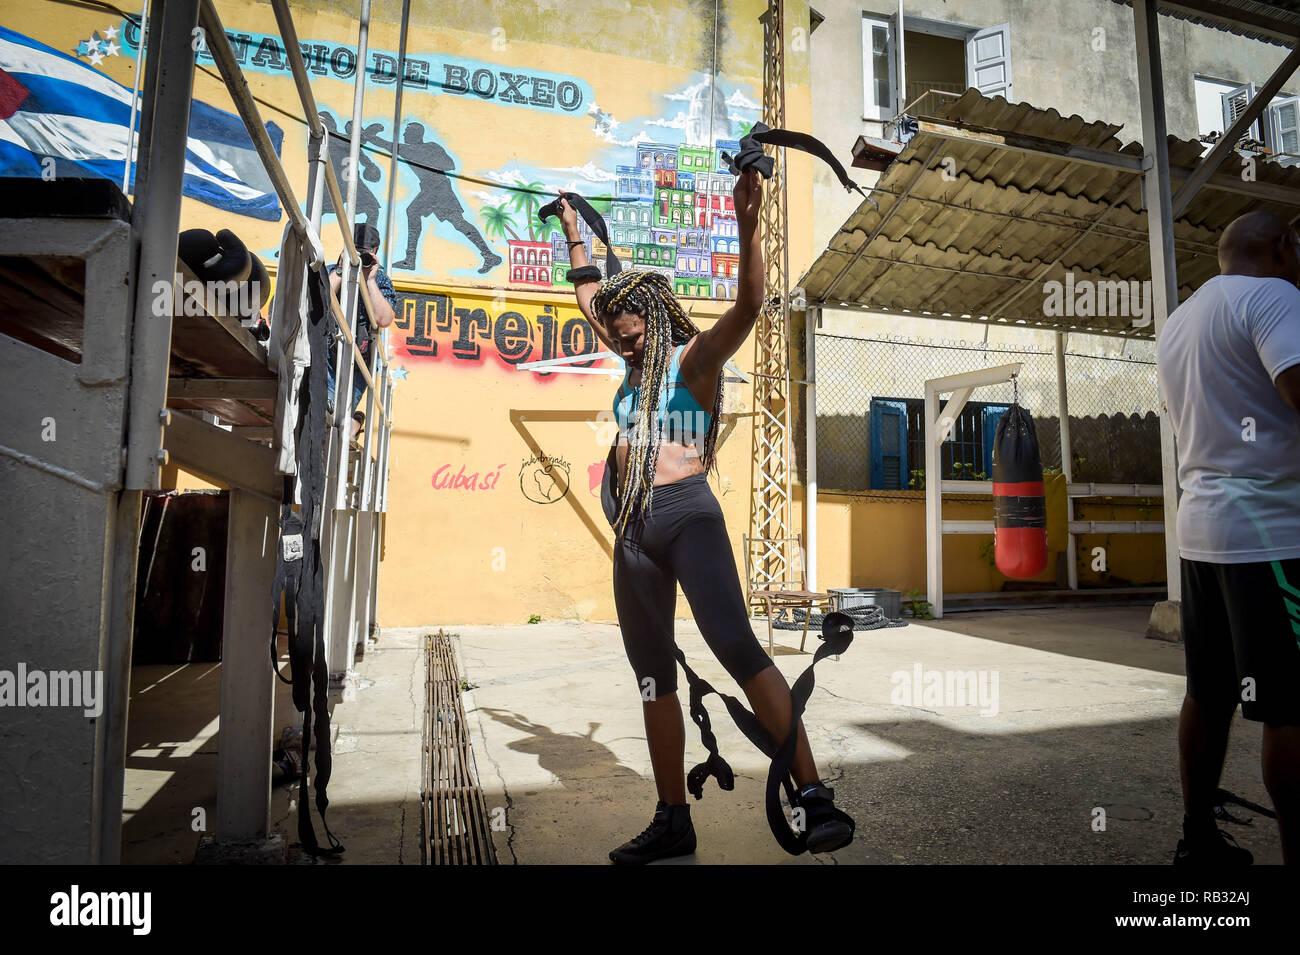 Havana, Havana, Cuba  9th Oct, 2018  A female boxer seen warming up